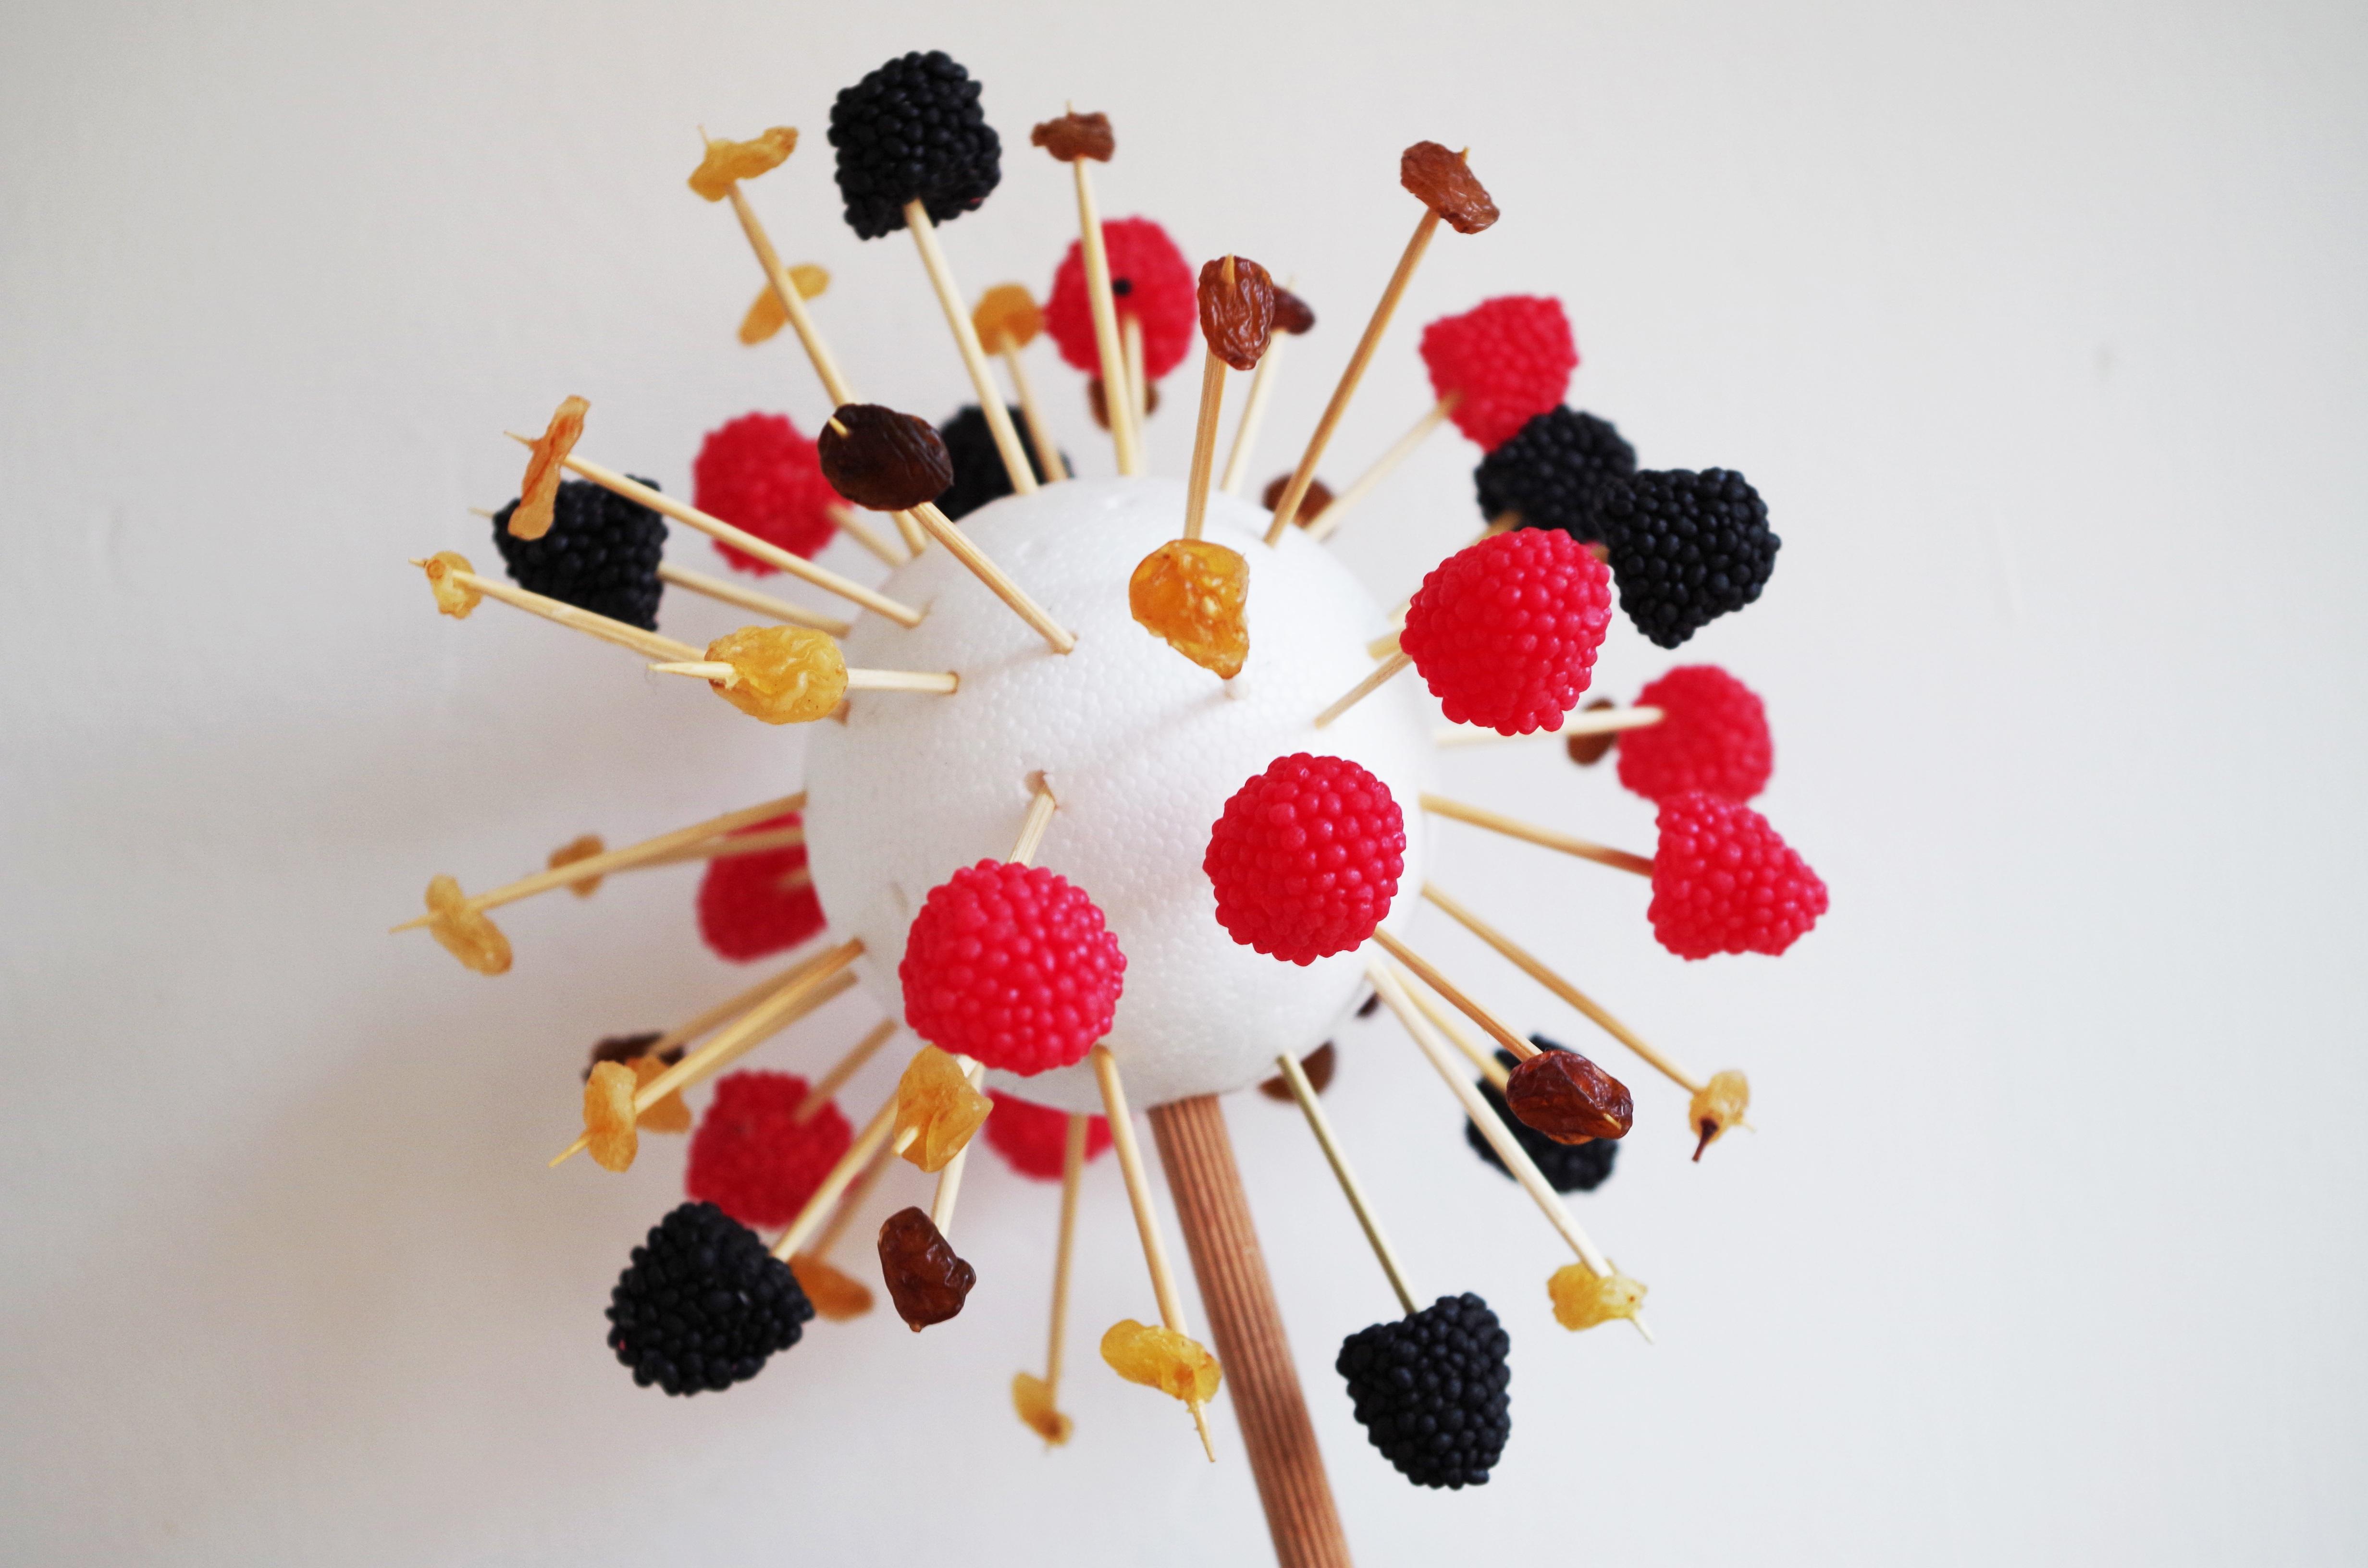 Free Images : plant, petal, food, red, produce, color, art, garnish ...